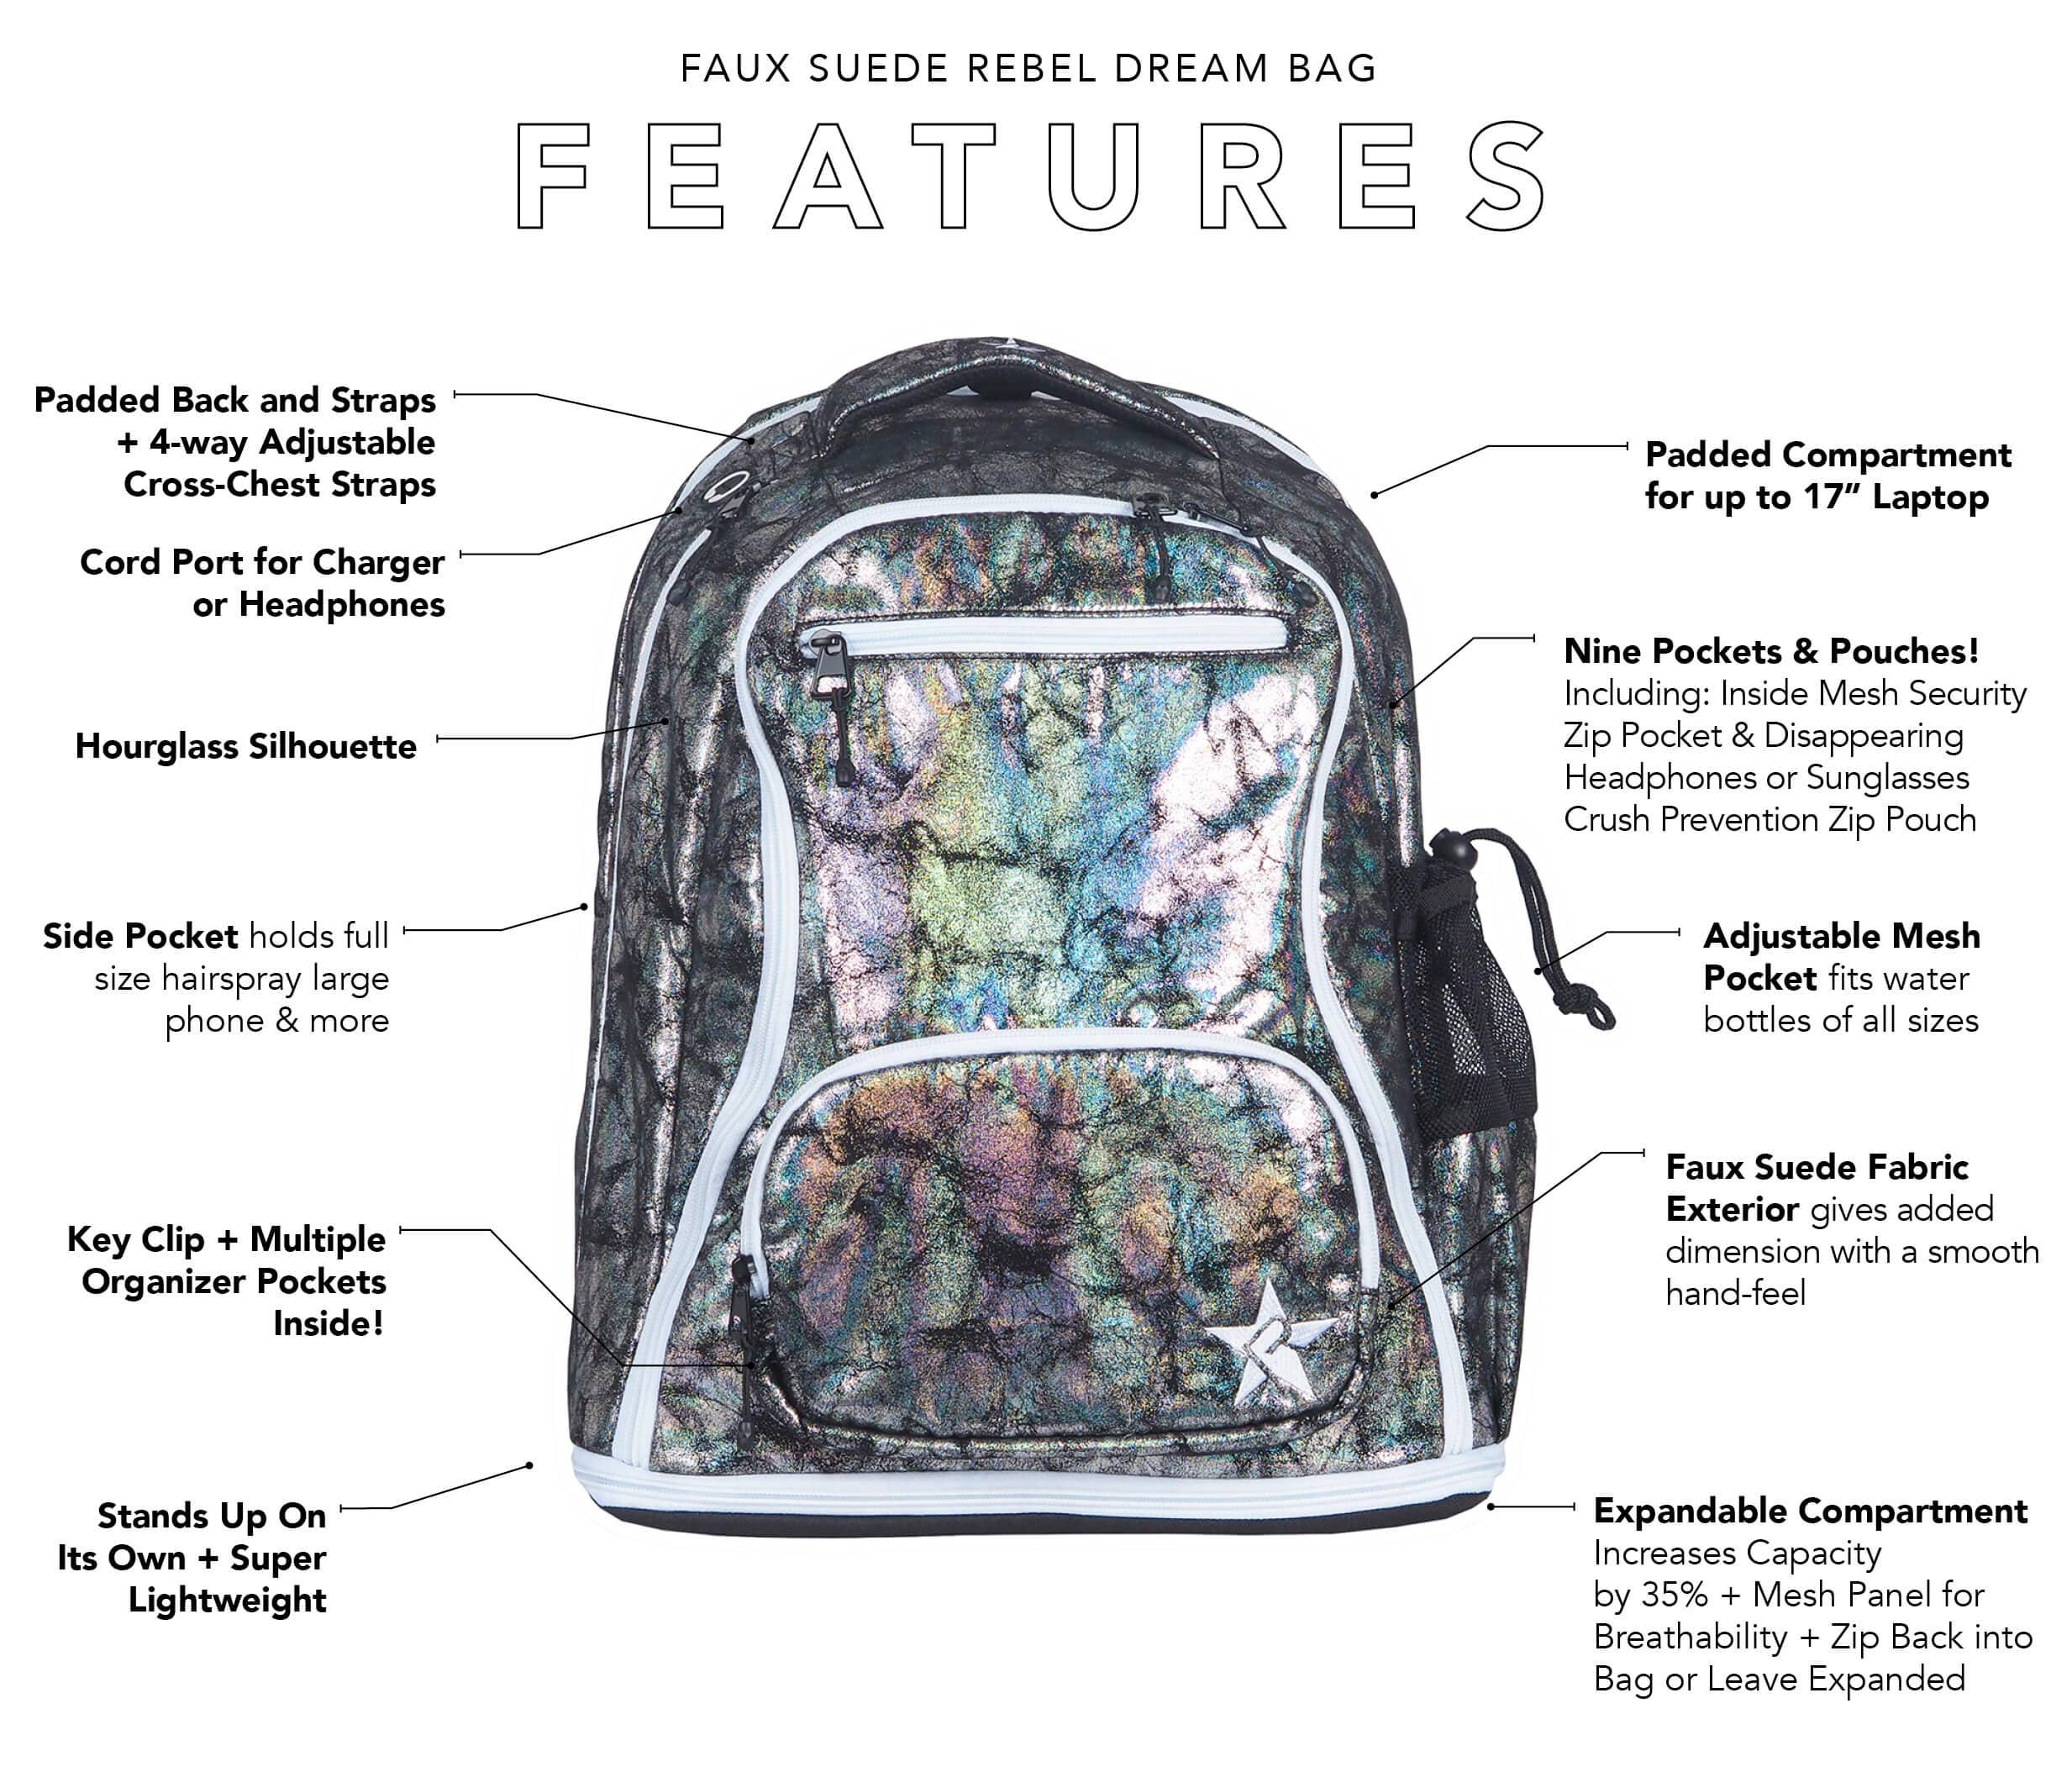 black faux suede rebel dream bag main features